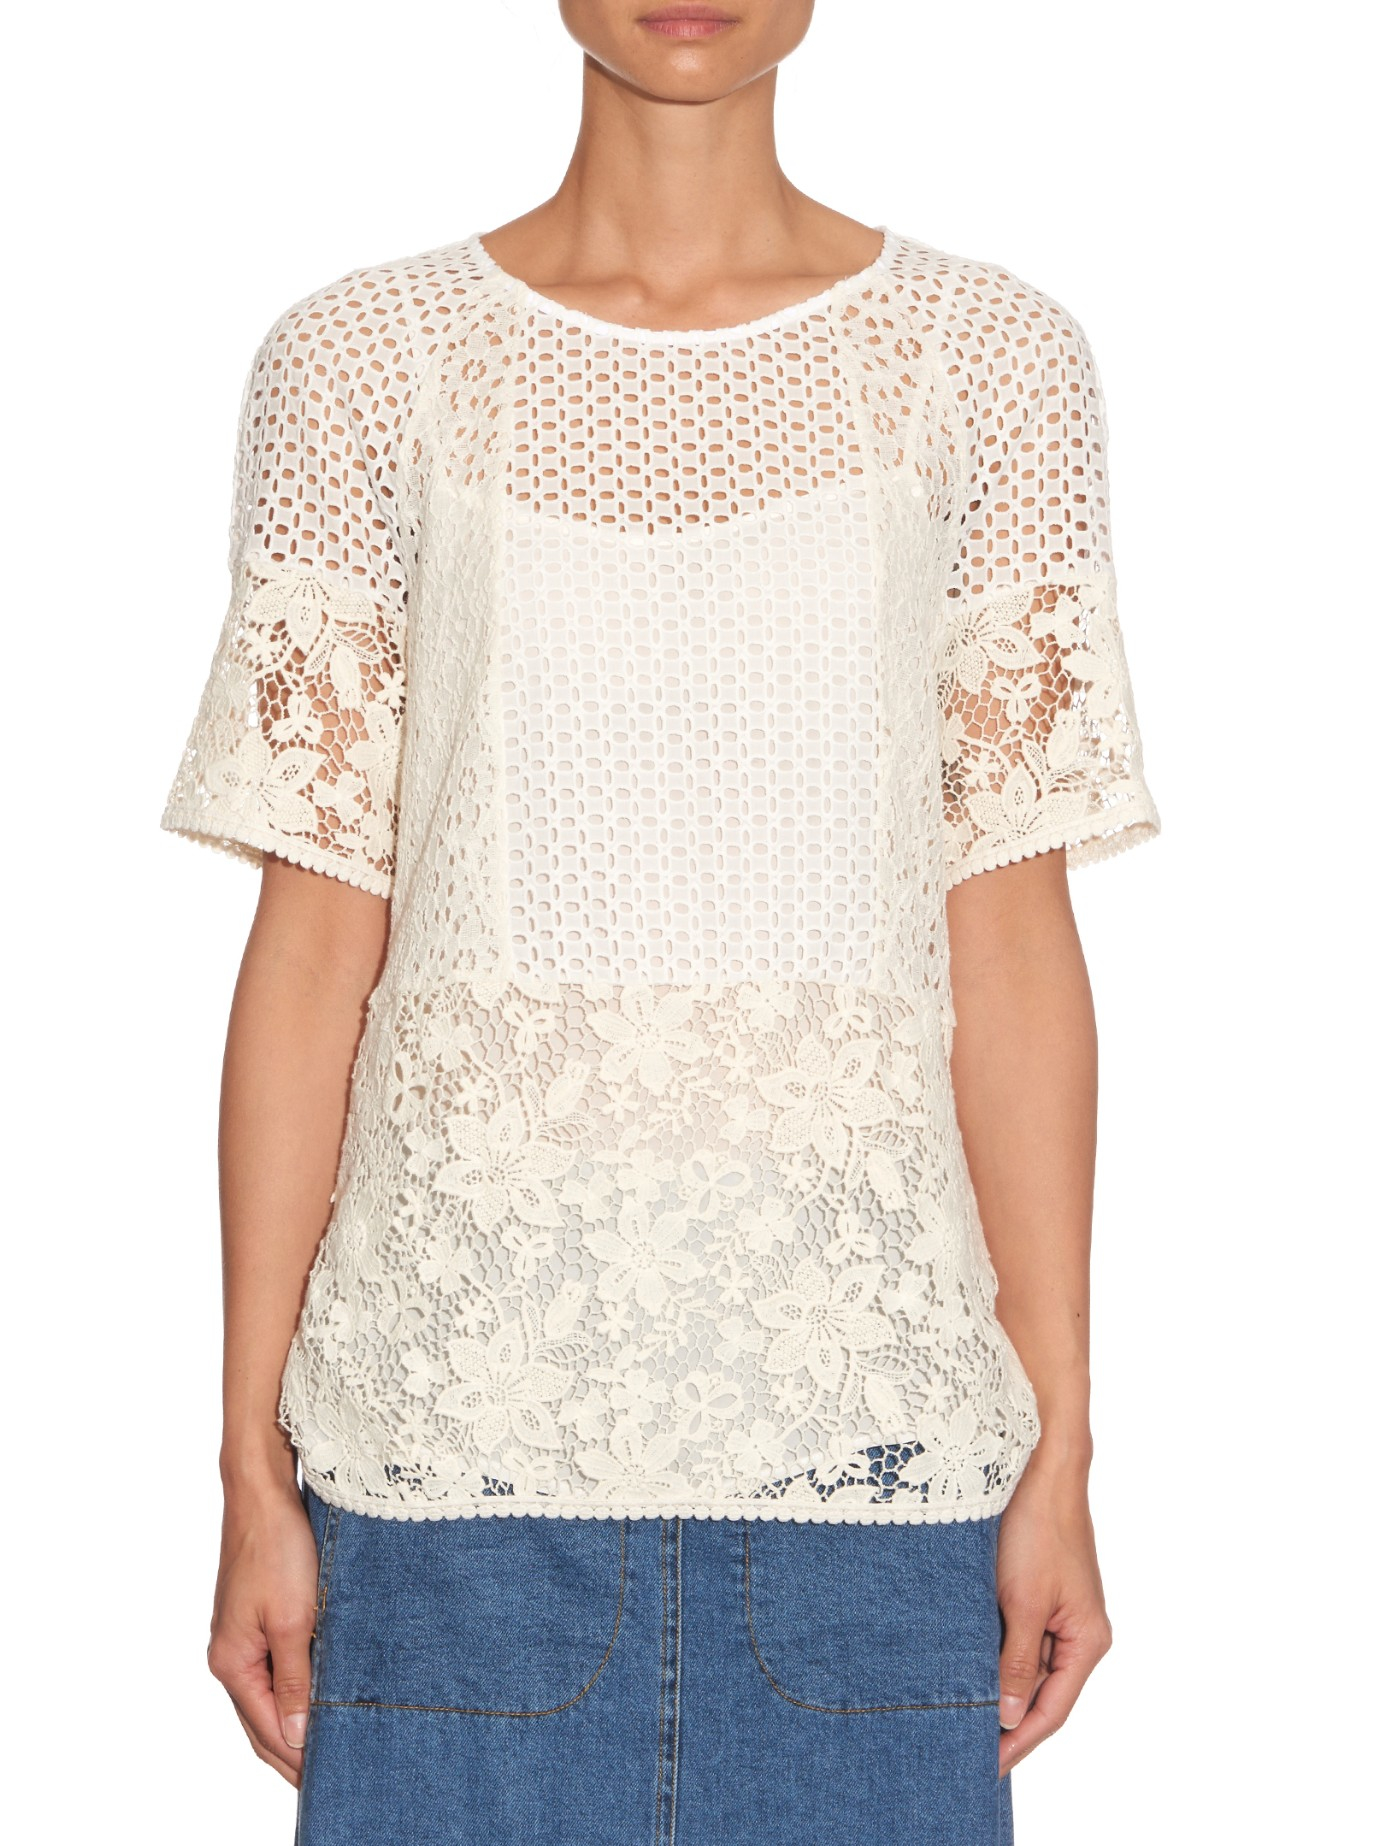 Lace cotton top Chloé Buy Cheap Purchase qlSjjFwA4v